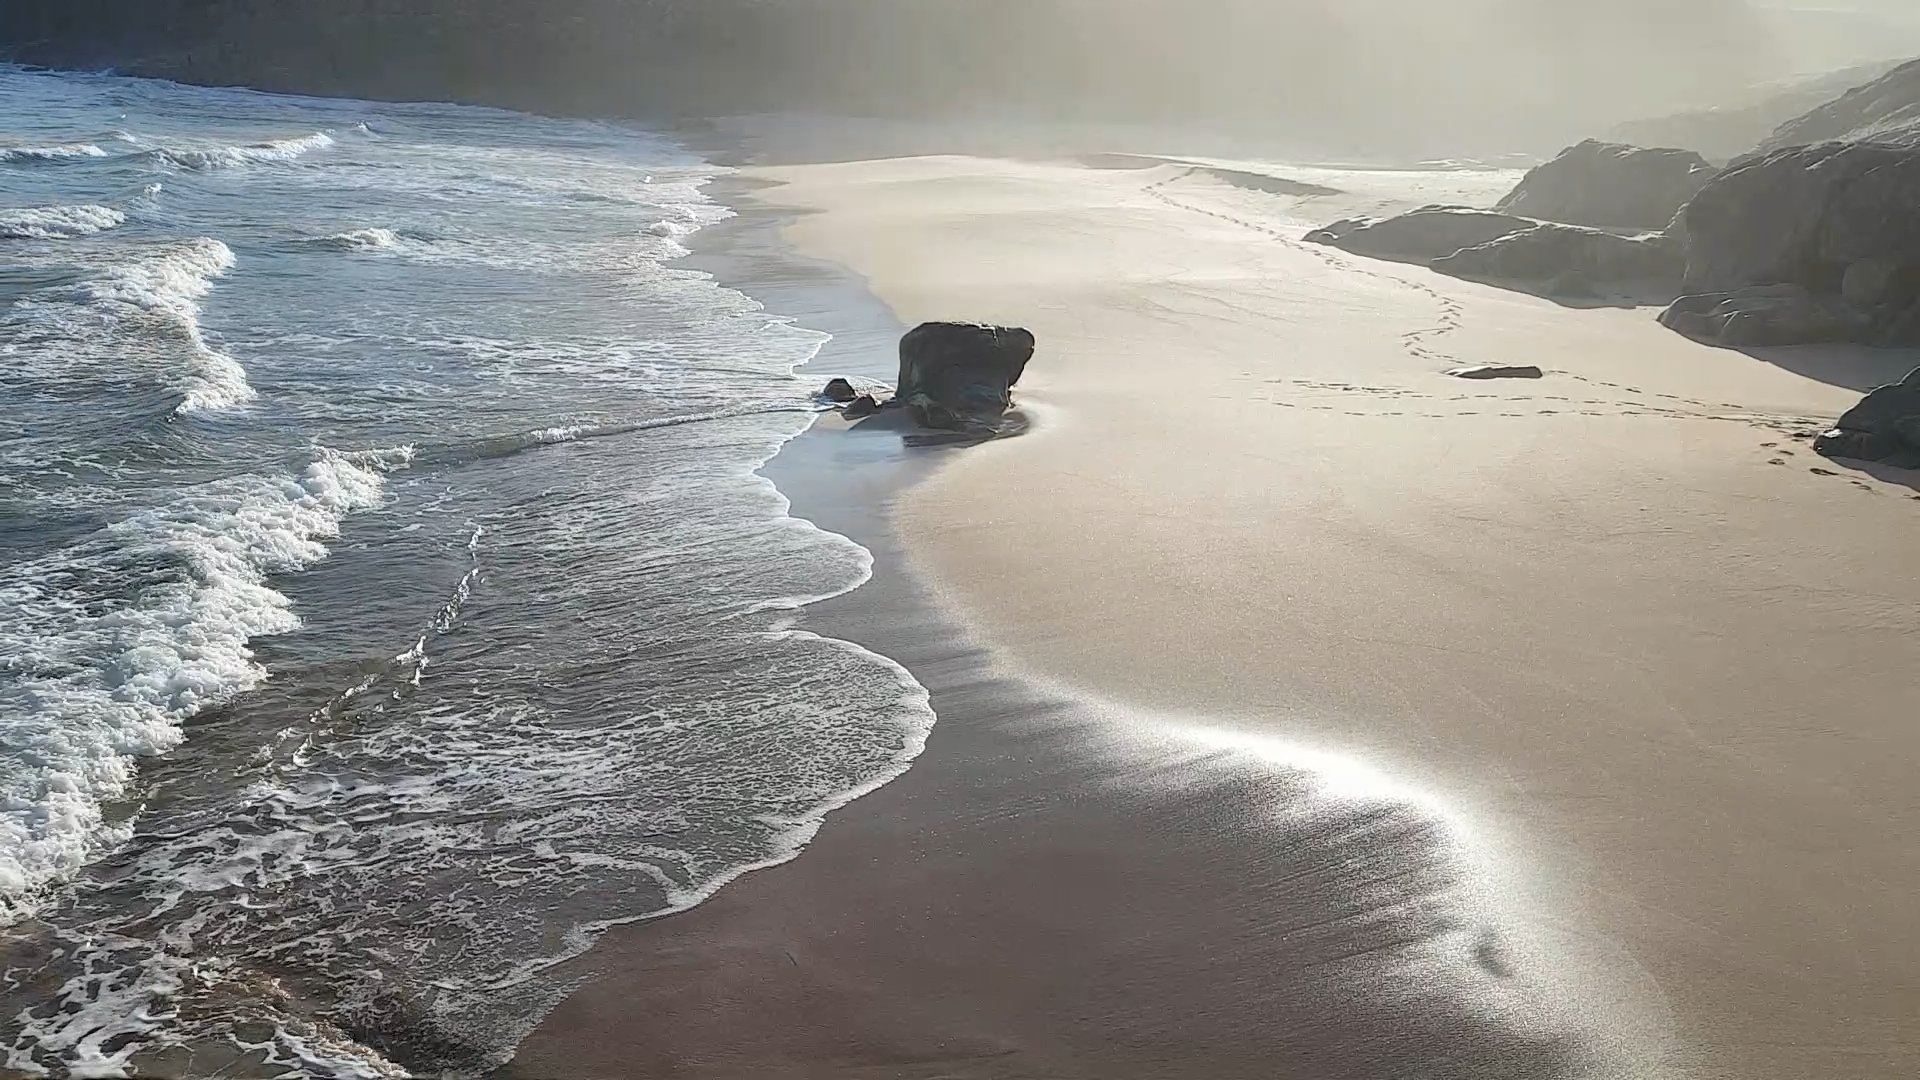 Early morning sun and mist light up the sand as a small surf hits the beach near Sandwood, Scotland